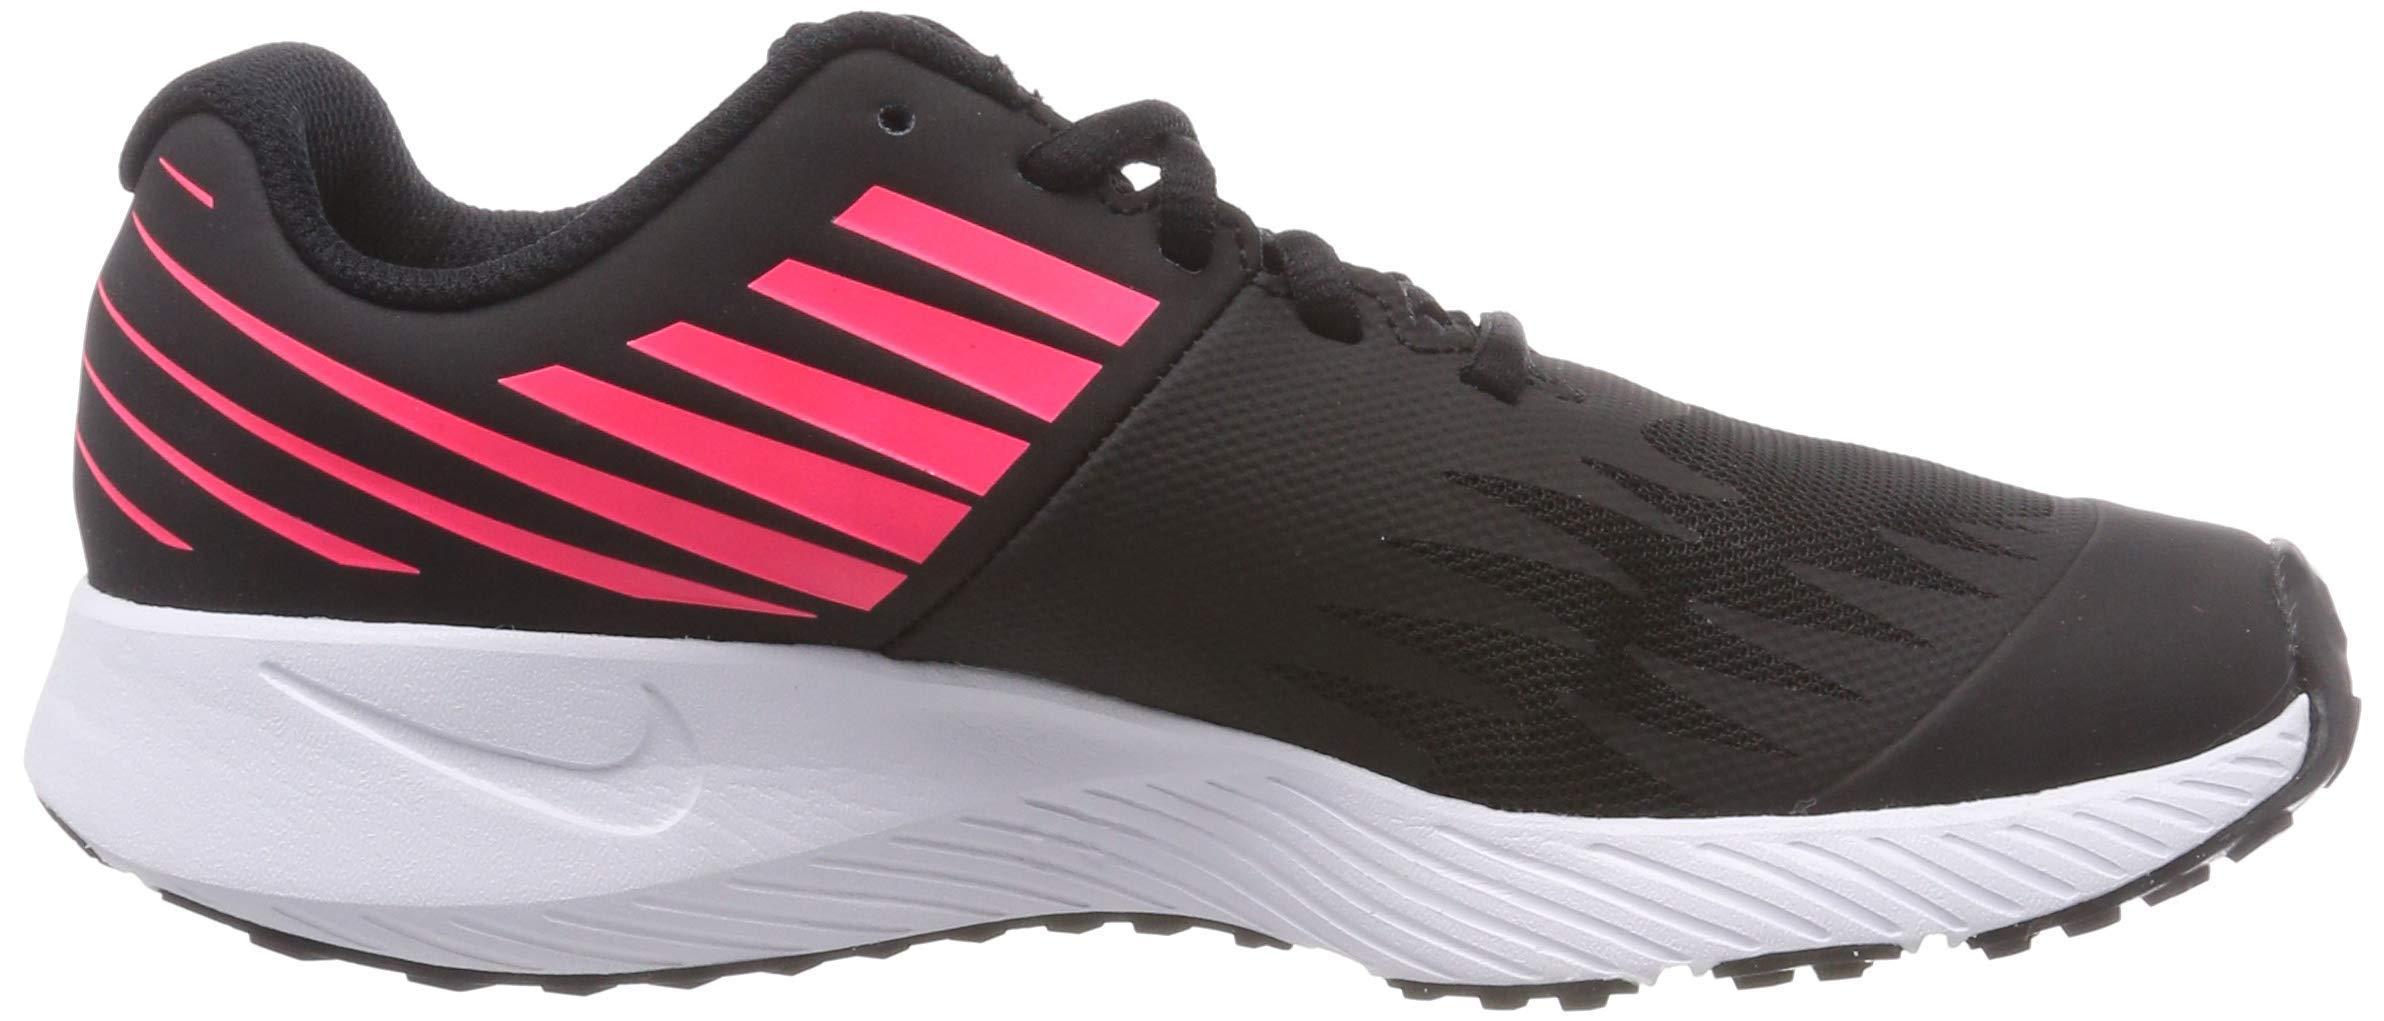 Nike Girl's Star Runner (GS) Running Shoe Black/Metallic Silver/Racer Pink/Volt Size 3.5 M US by Nike (Image #7)